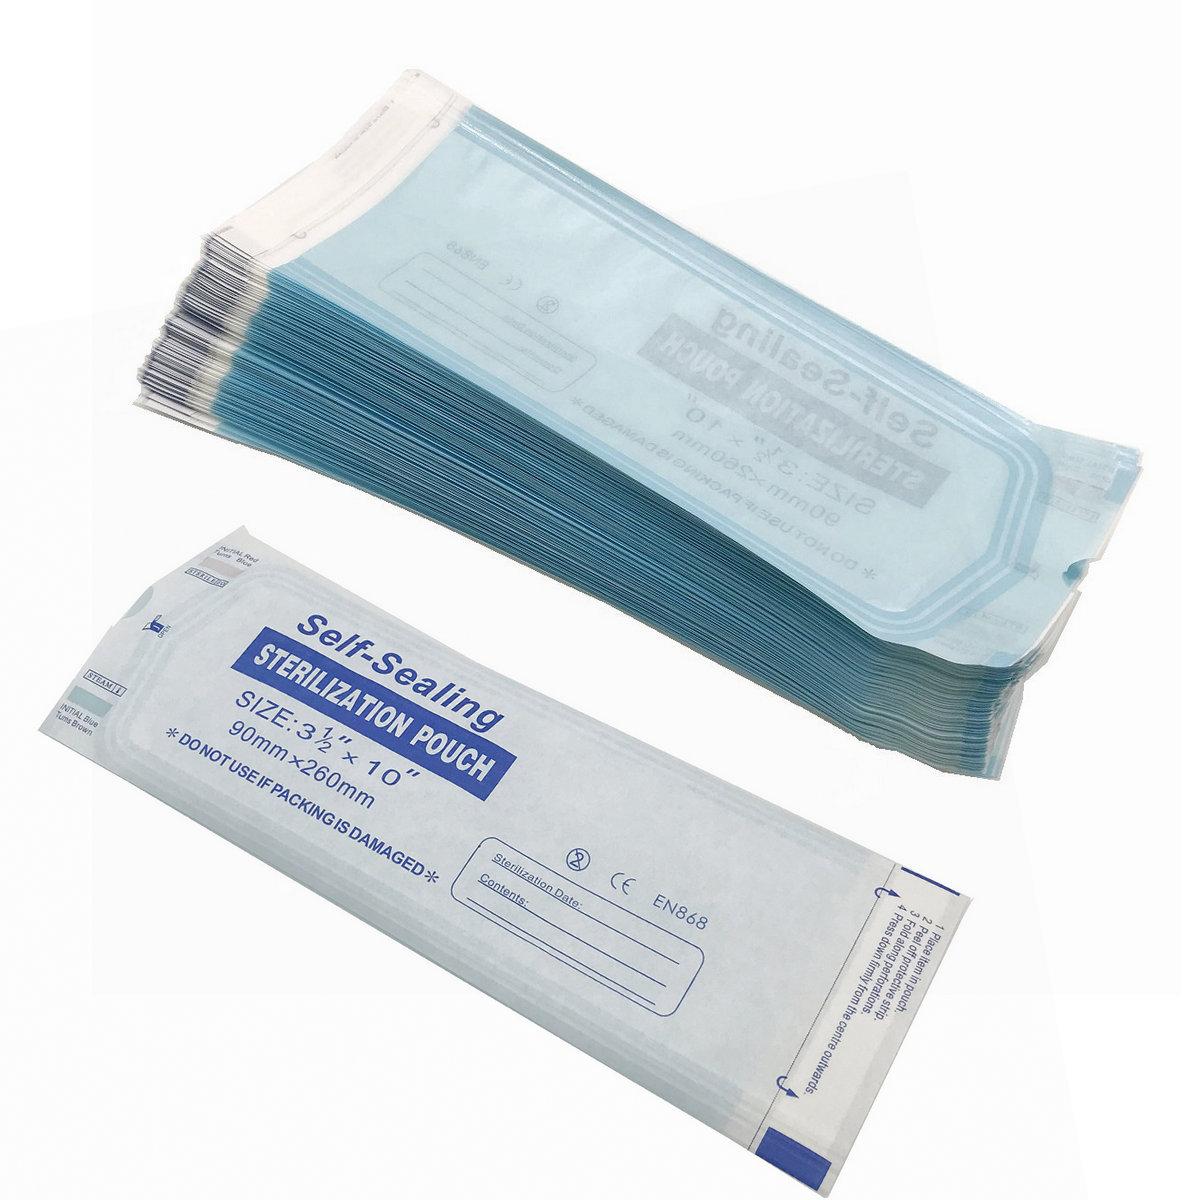 200pcs High Quality Self-Sealing Sterilization Bag  Self-Sealing Sterilization Pouch 90*260mm